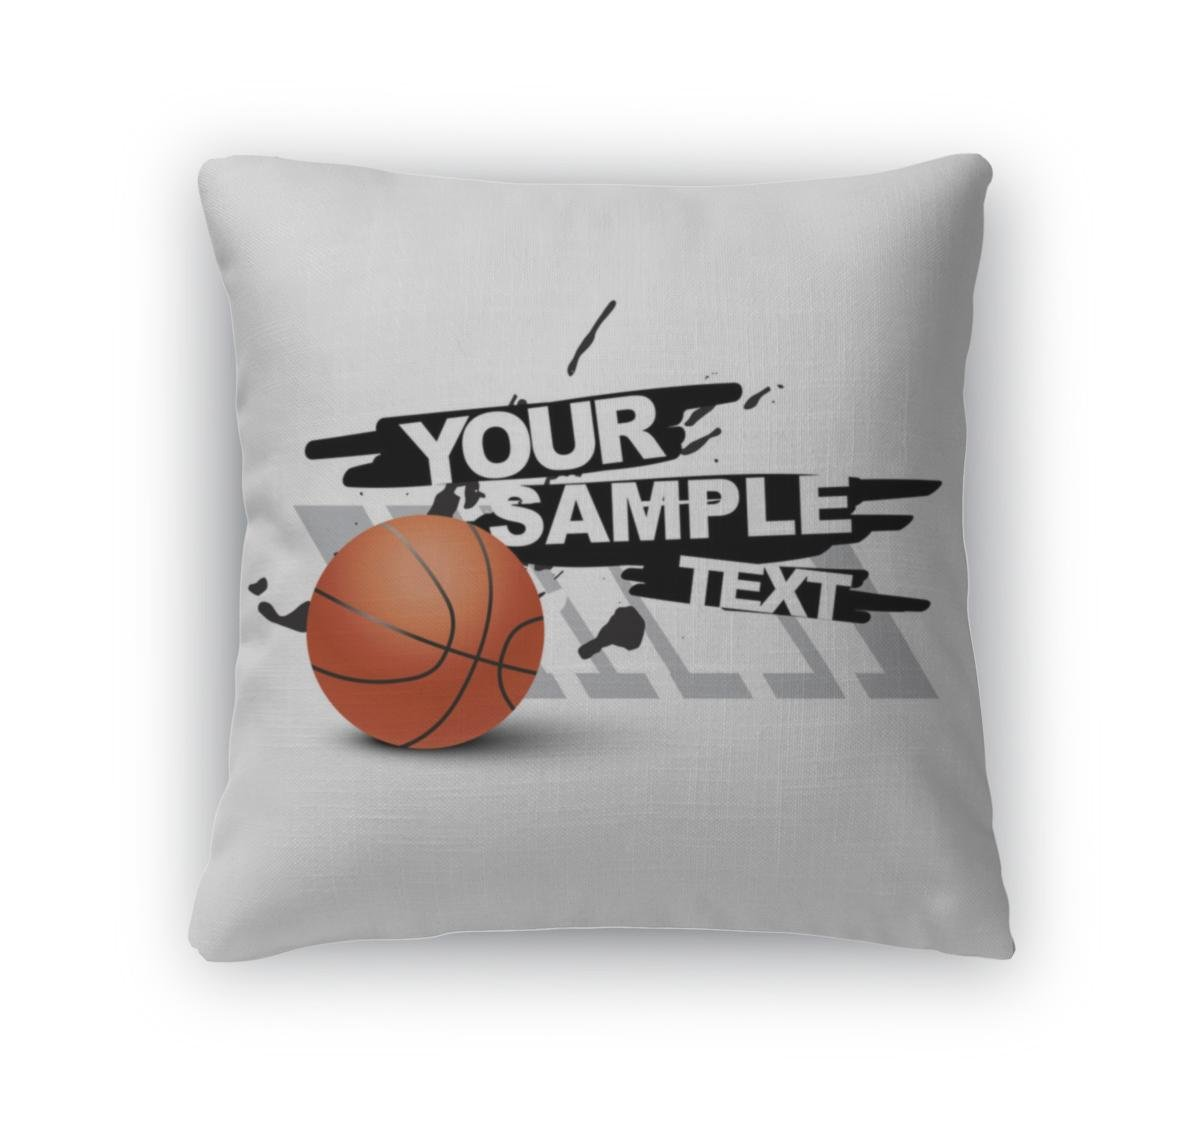 Gear nueva manta almohada Accent Decor, baloncesto, 6282874 GN ...